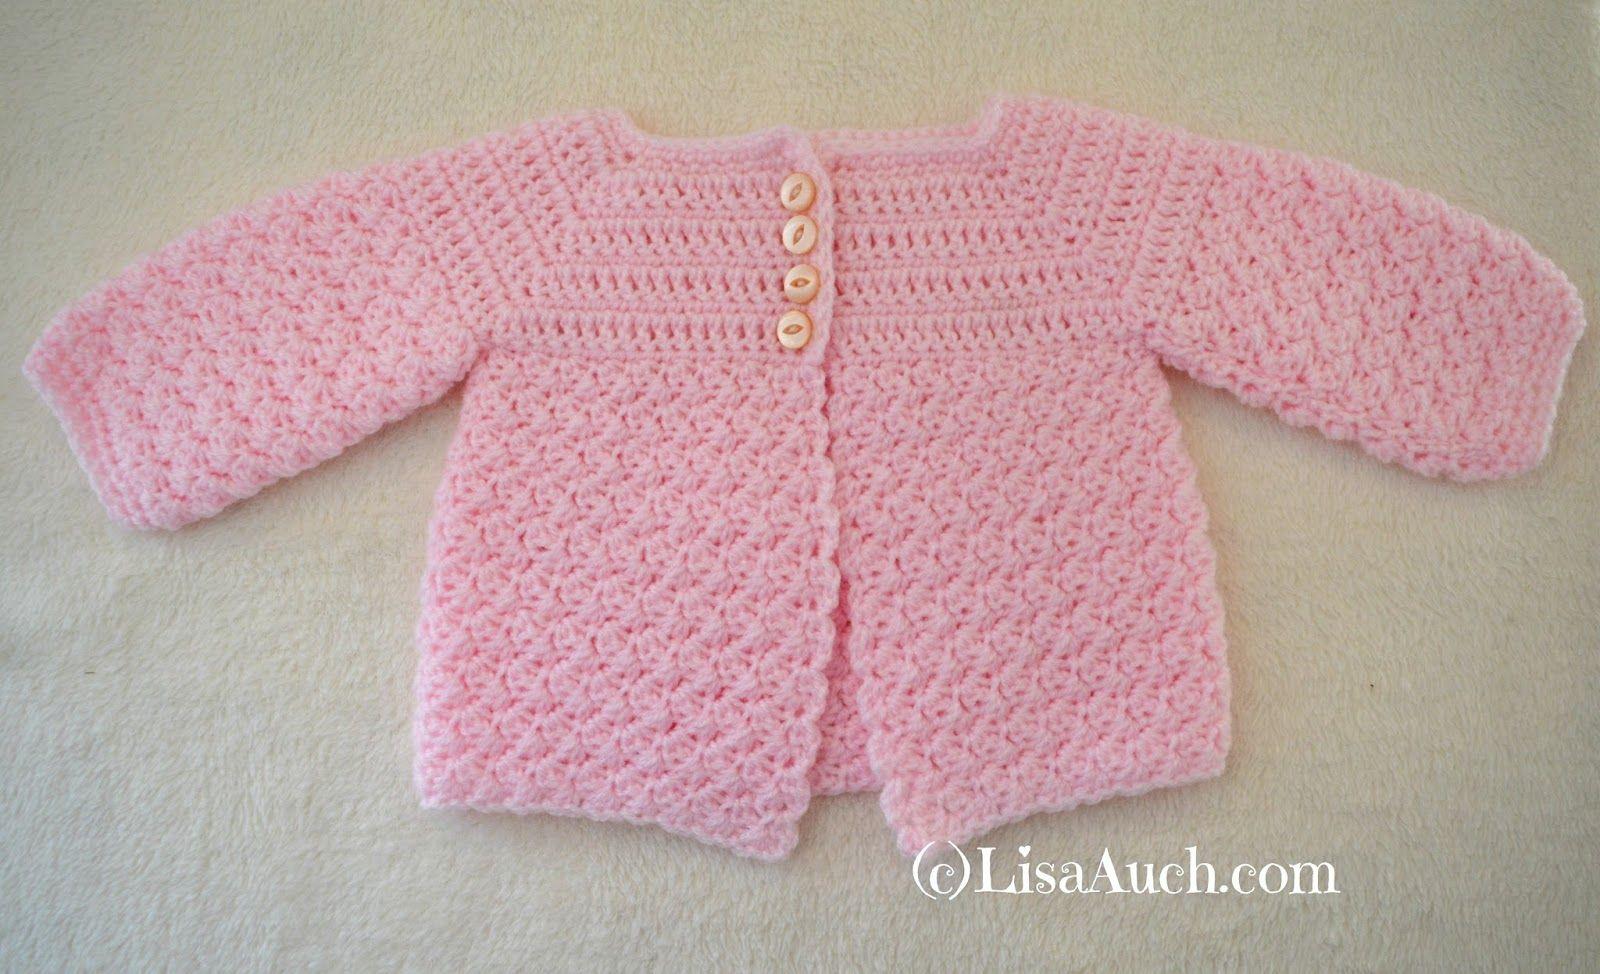 Crochet Baby Cardigan Easy Free Pattern | saco | Pinterest | Crochet ...